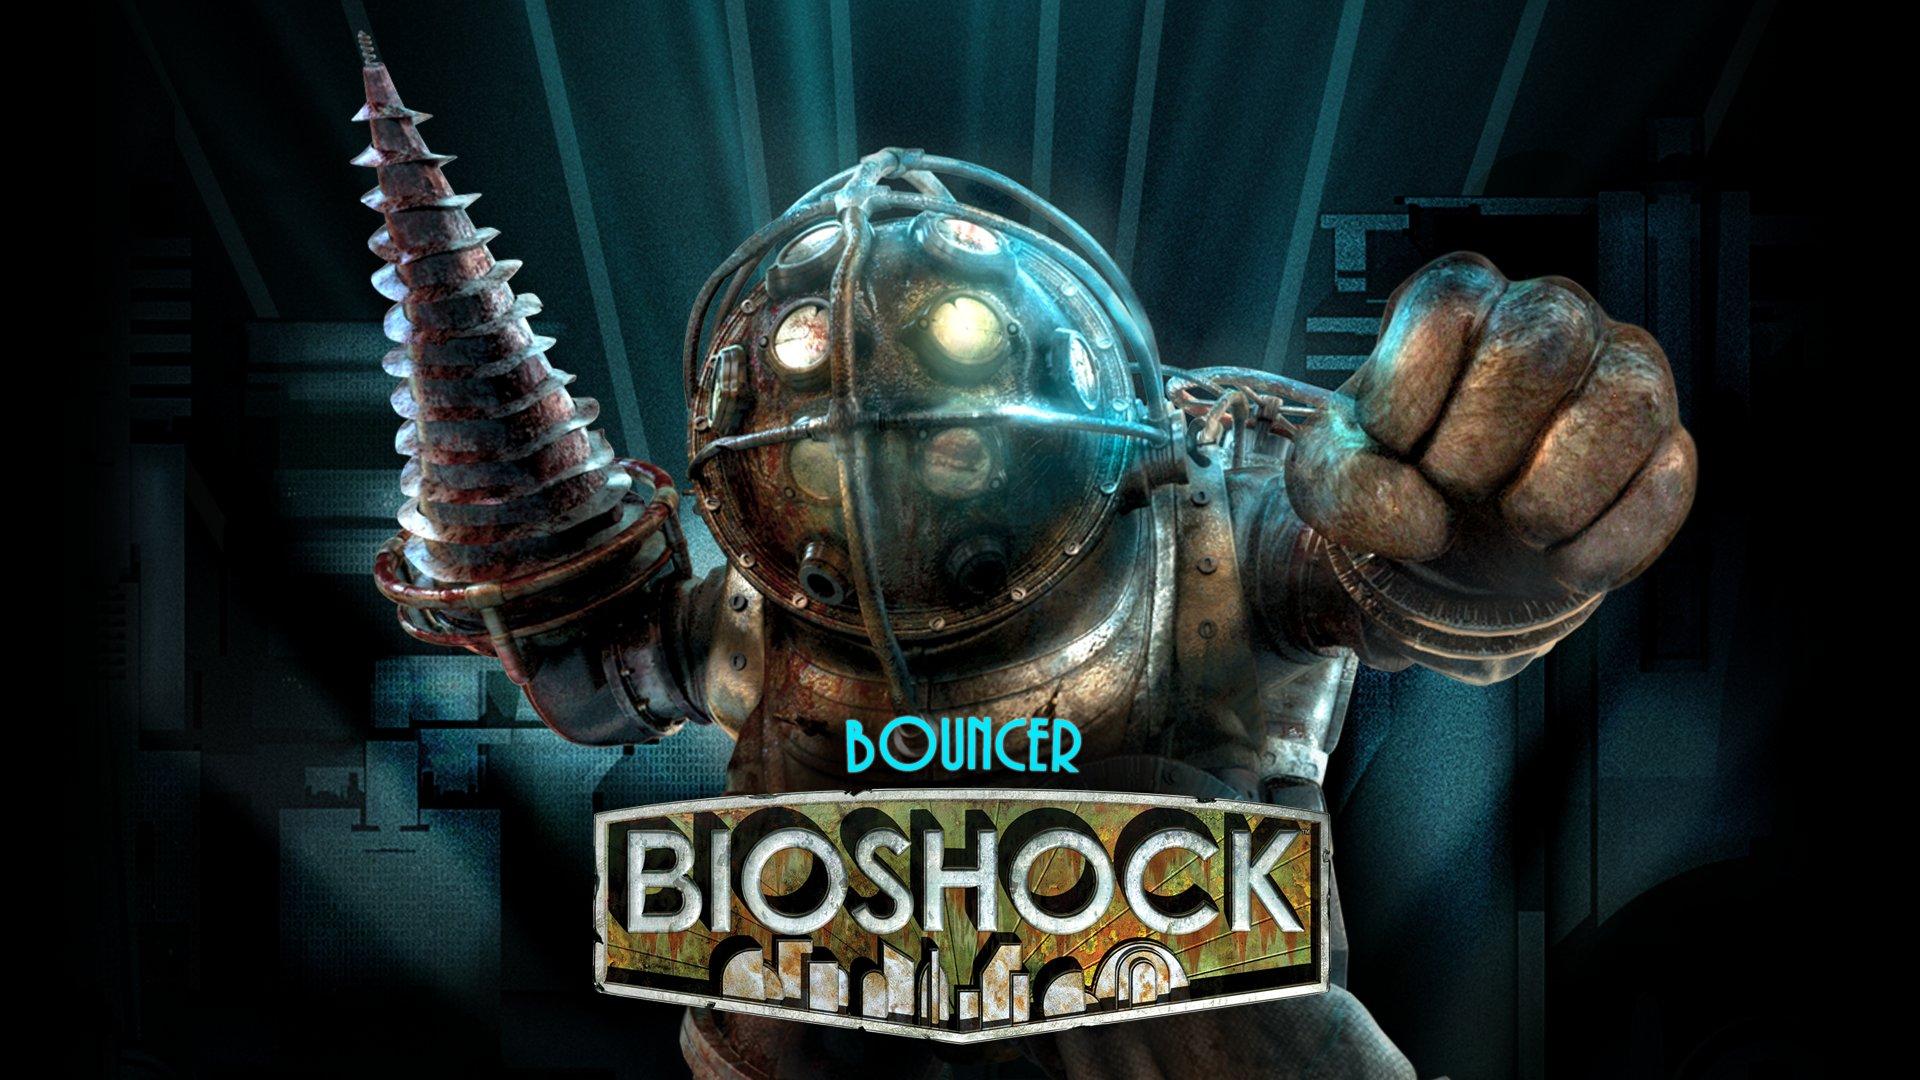 Bioshock remastered bouncer steam trading cards wiki - Bioshock wikia ...